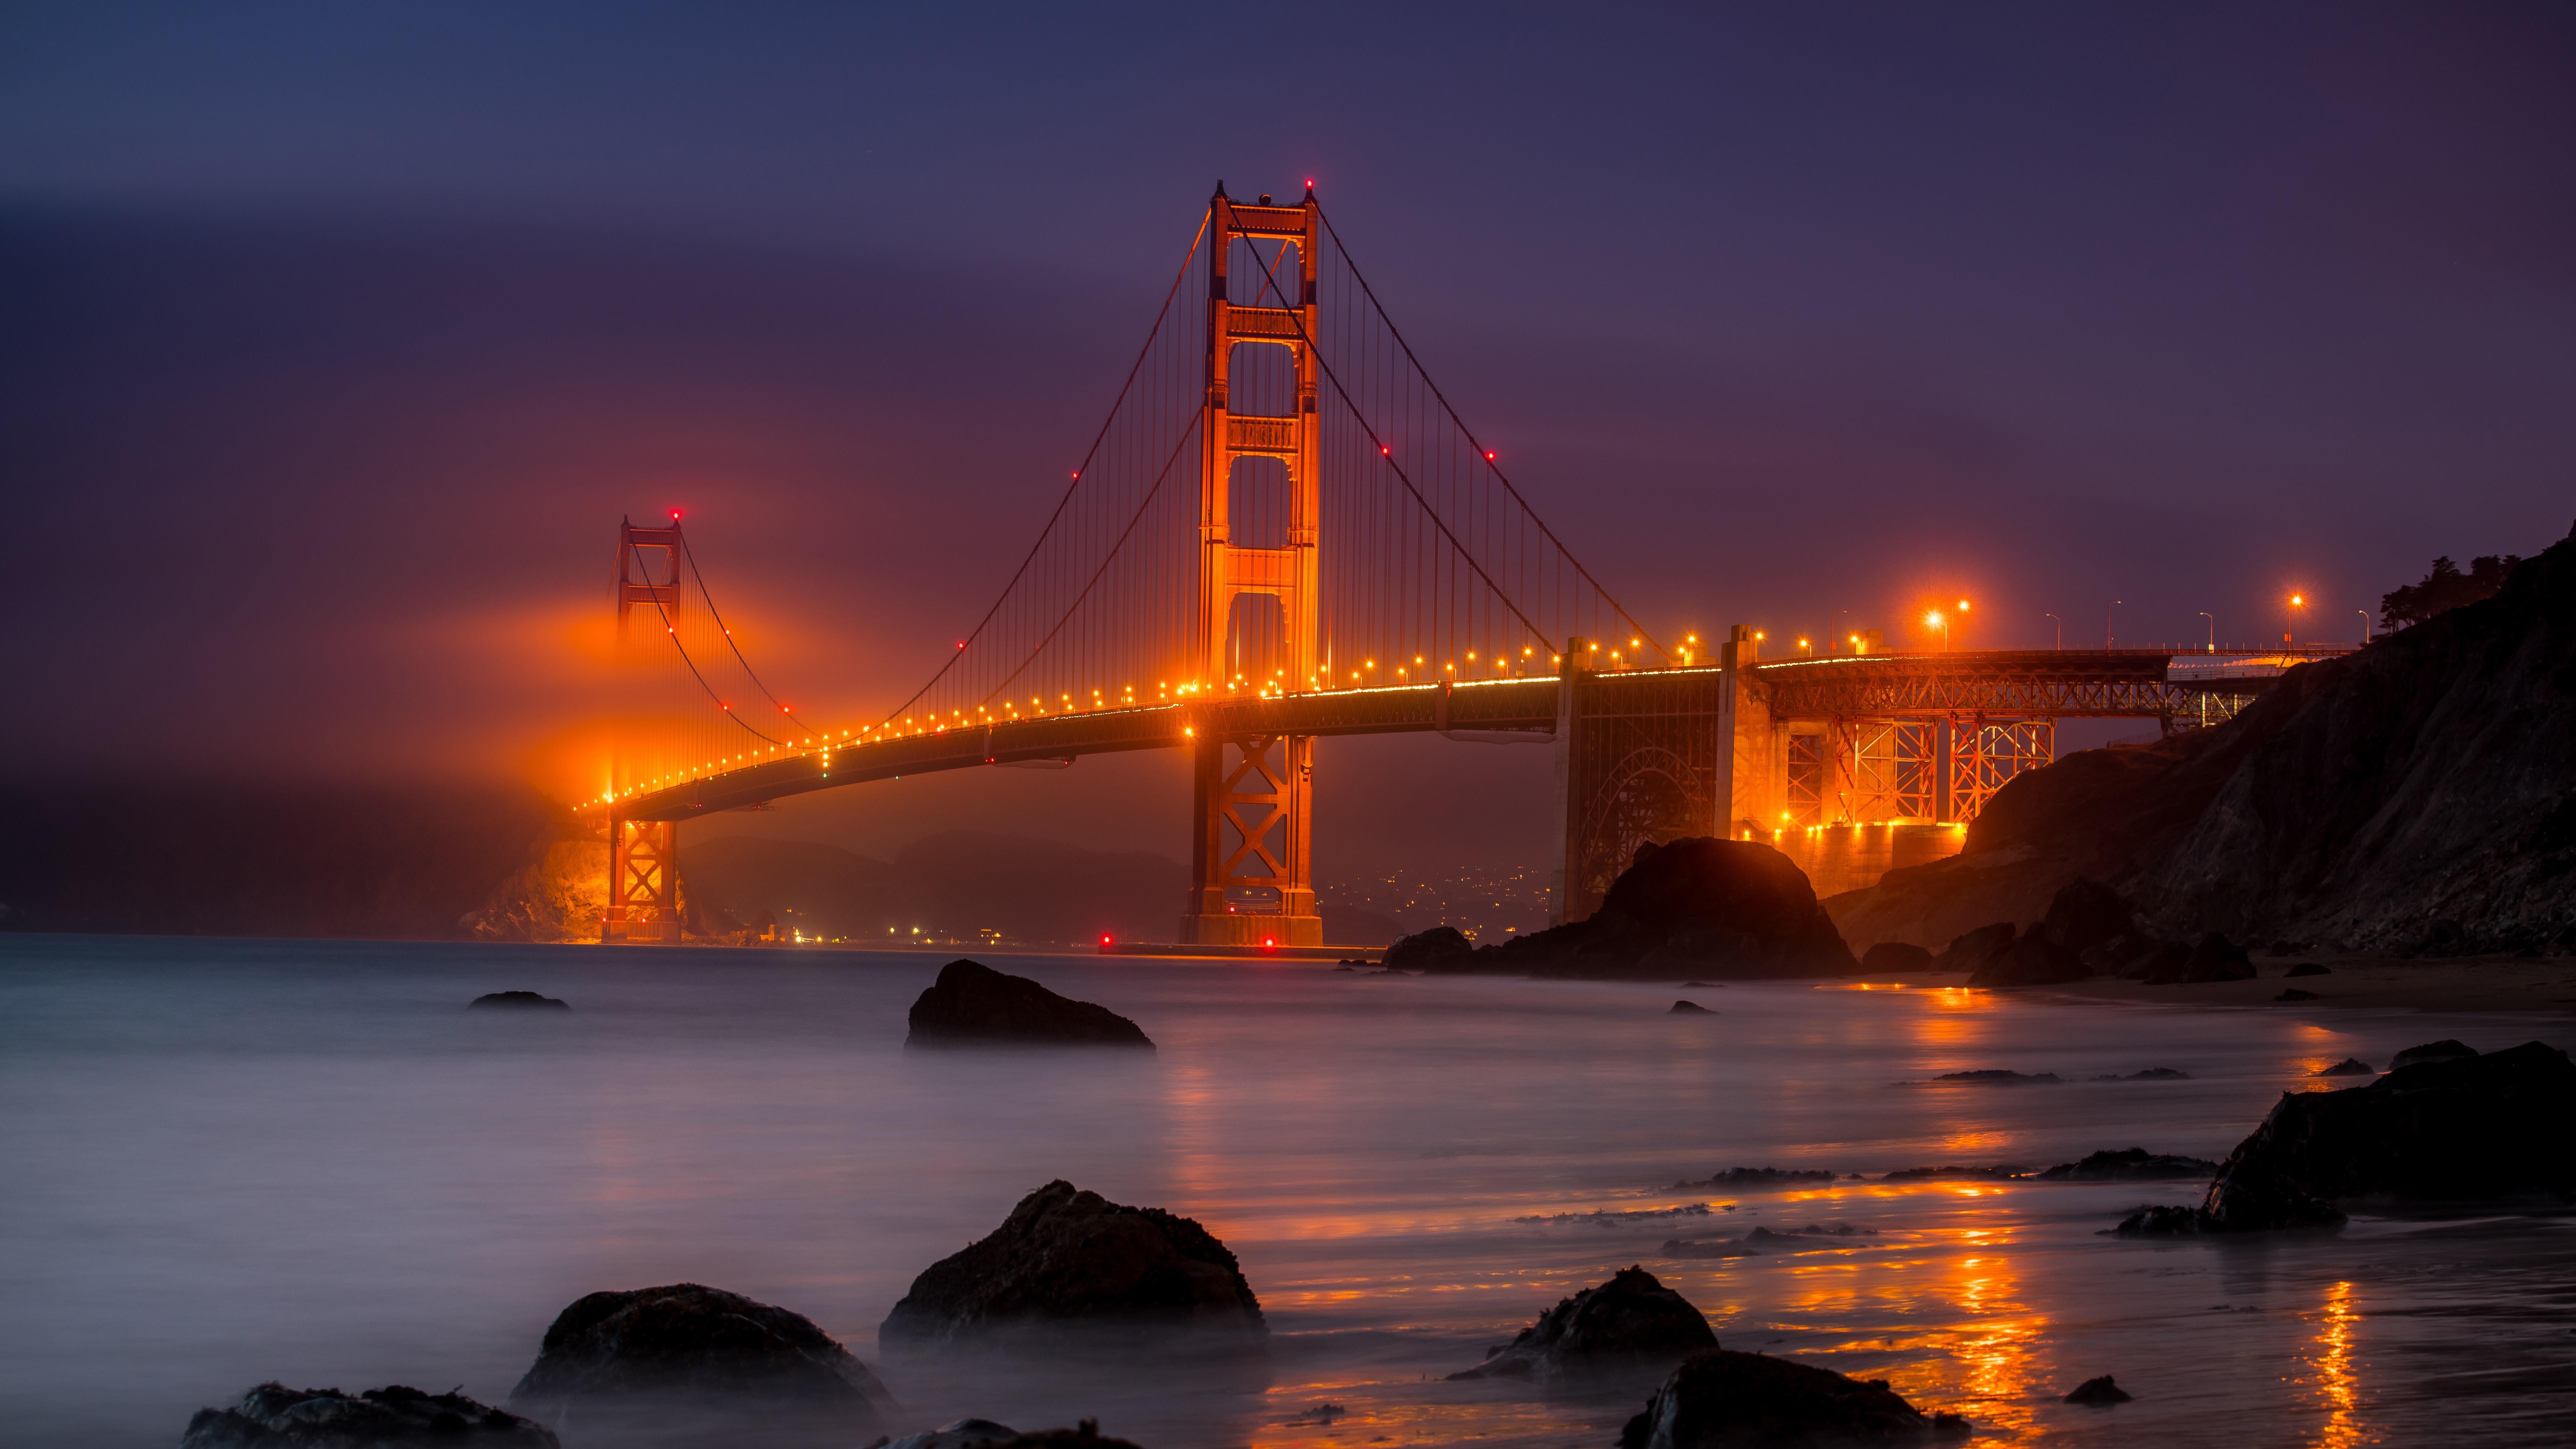 Golden Gate Bridge at night wallpaper